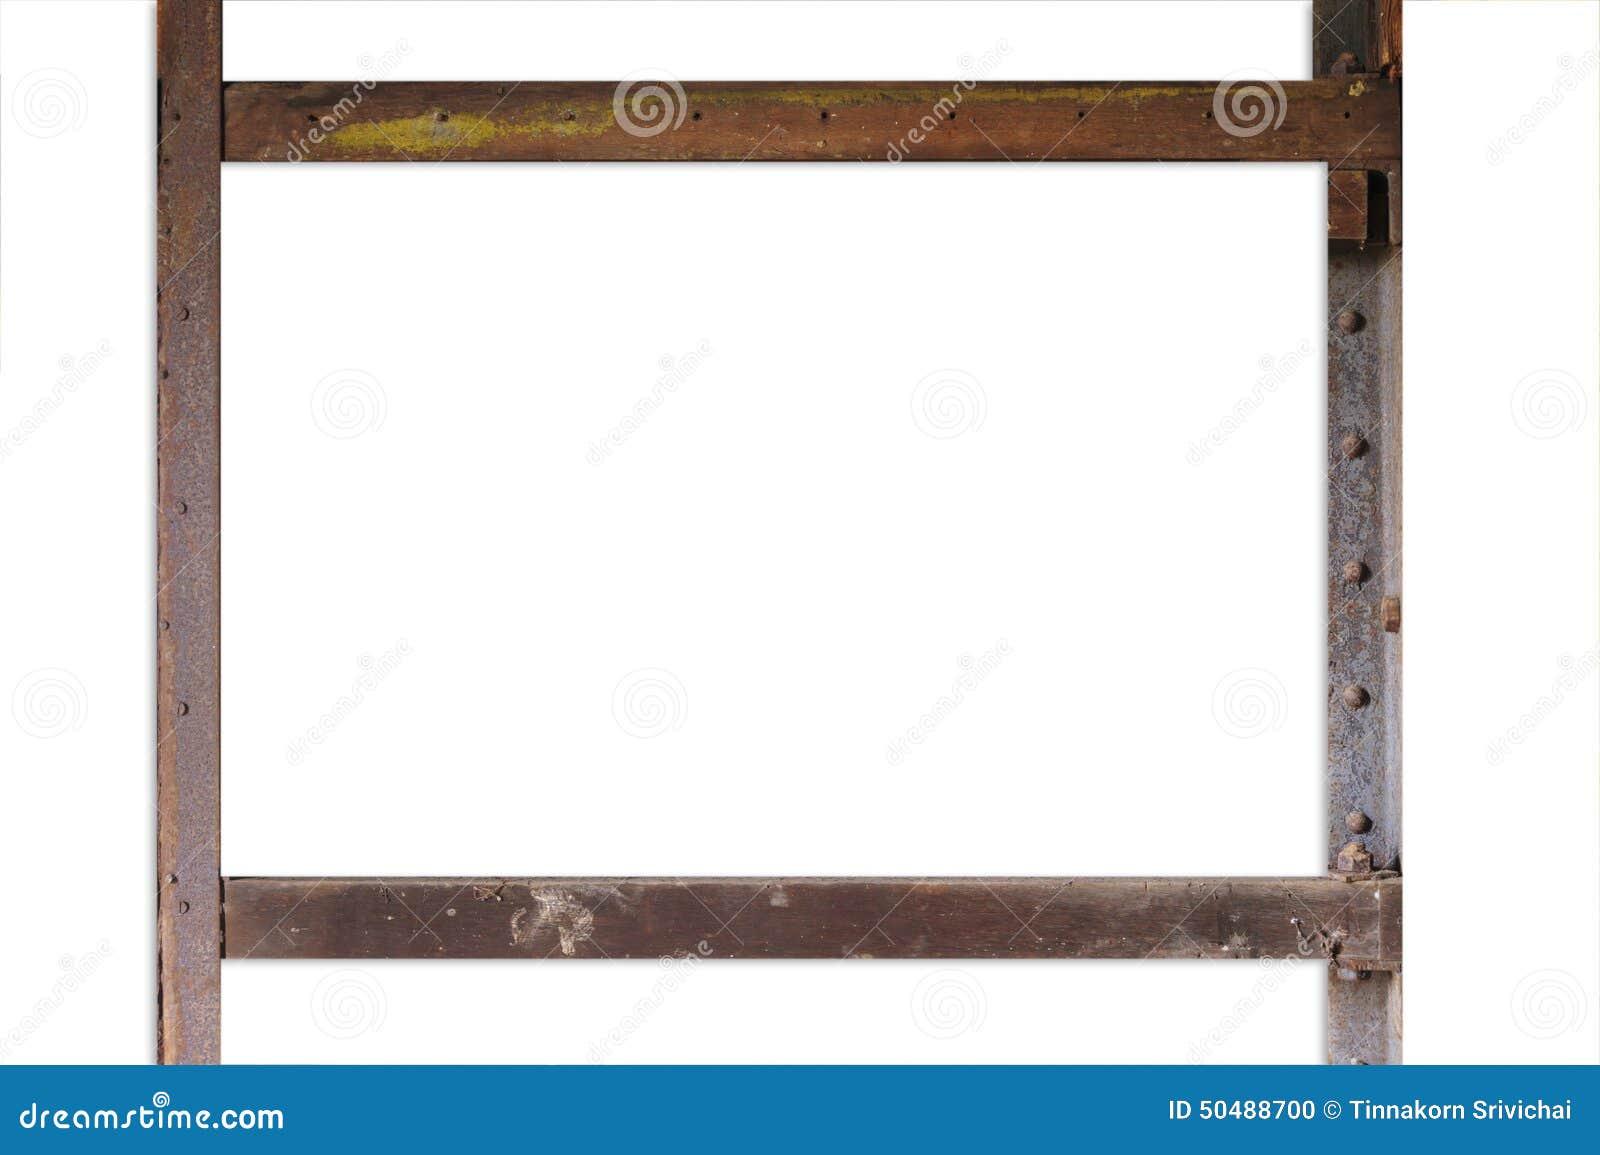 Rust border square frame stock photo. Image of grunge - 50488700